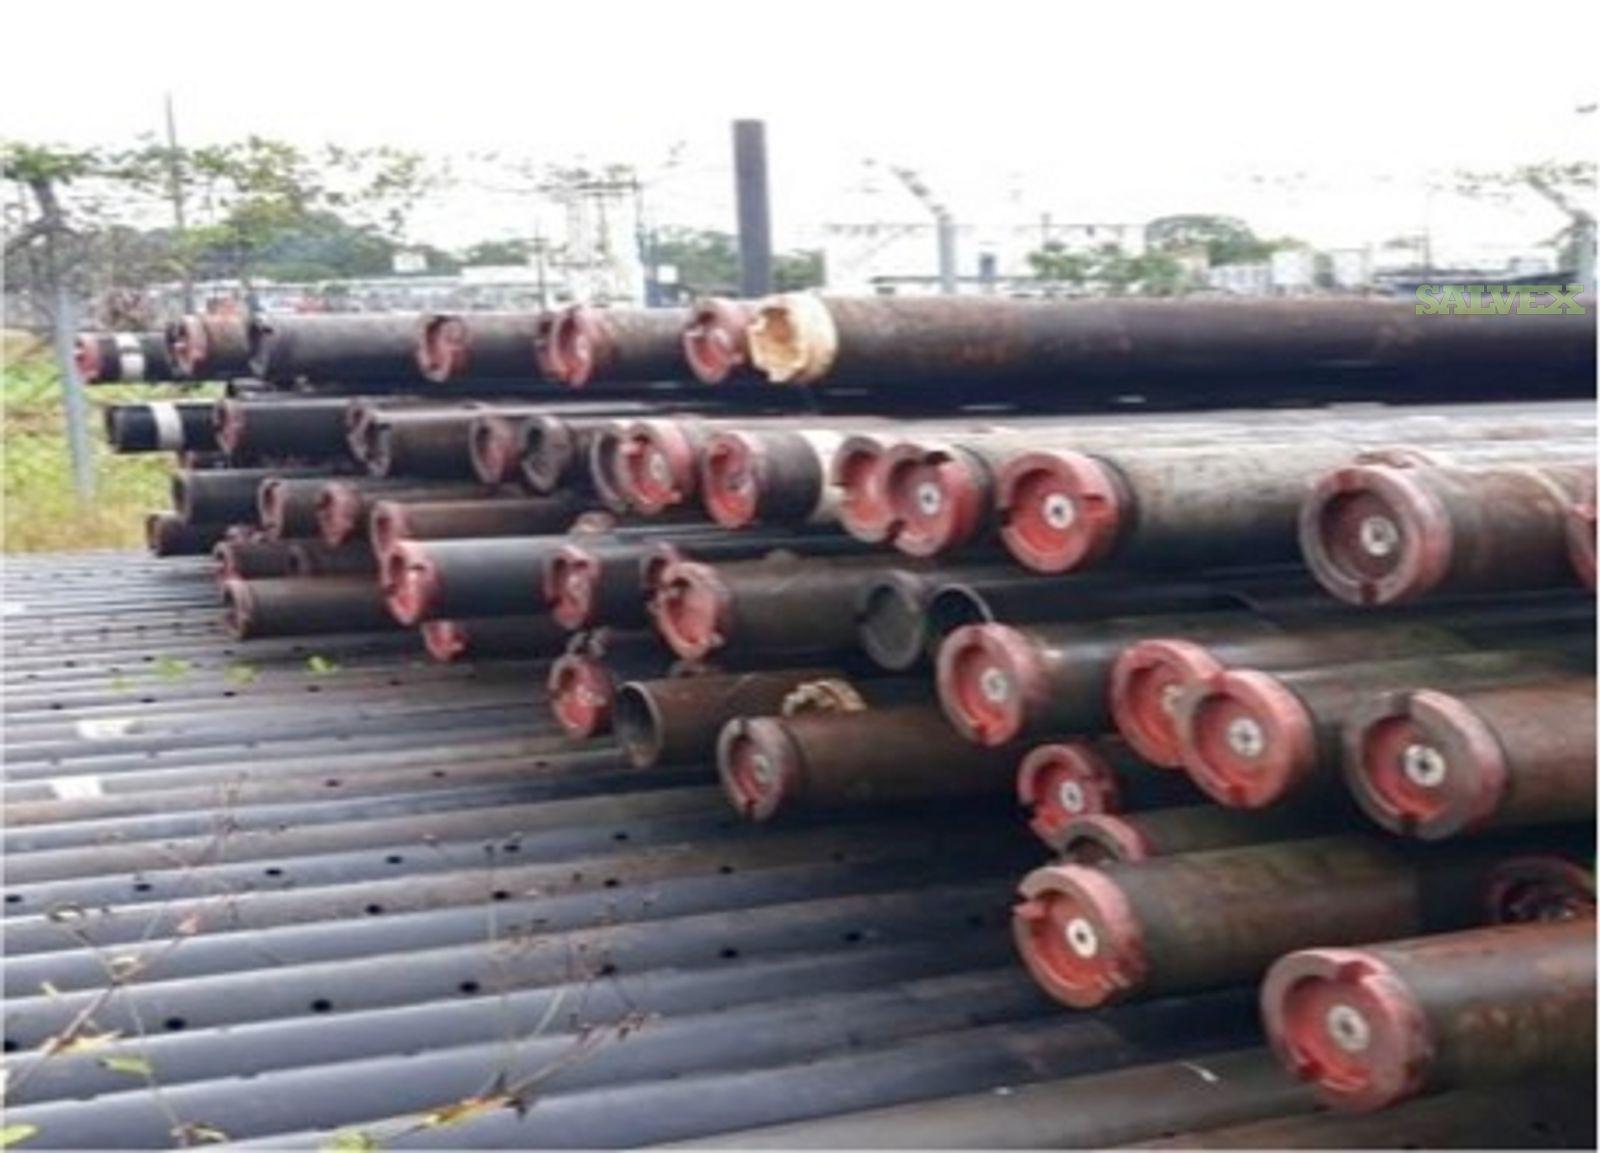 4 1/2 15.5# P110 PH-6 R3 Surplus Casing (4,070 Feet / 29 Metric Tons)